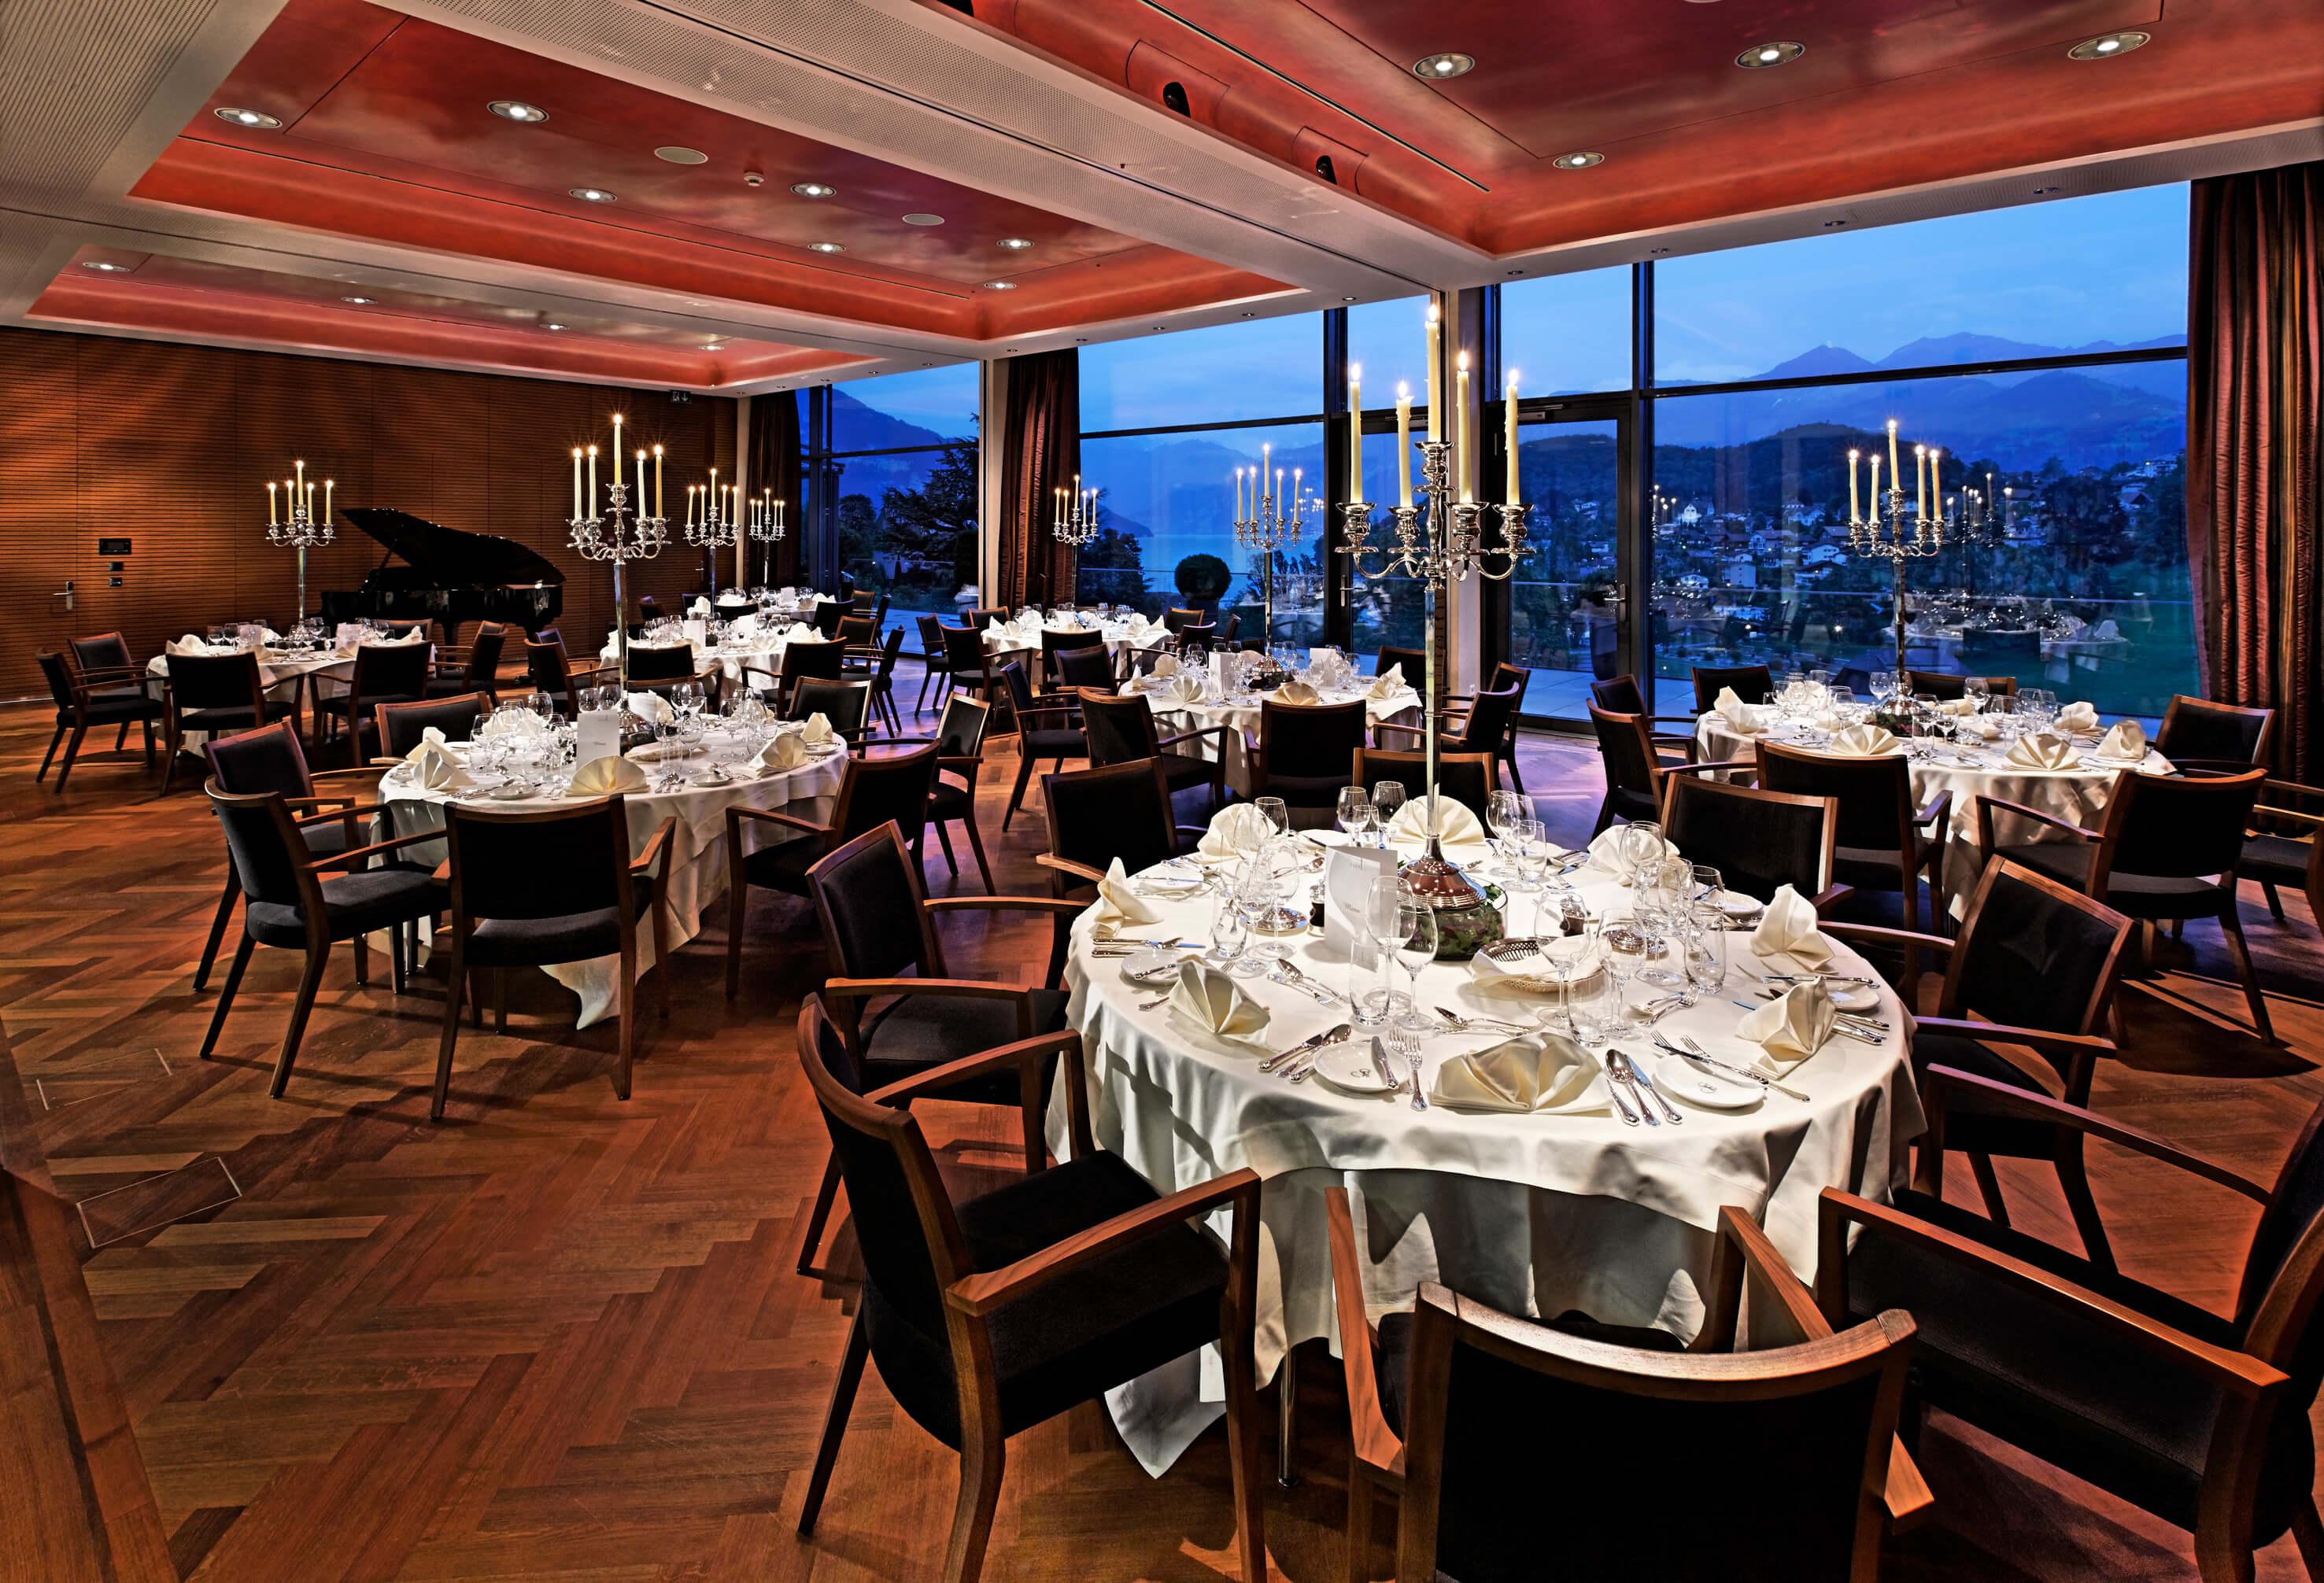 hotel-eden-meting-panoramasaal-fr-bankette-spiez.jpg